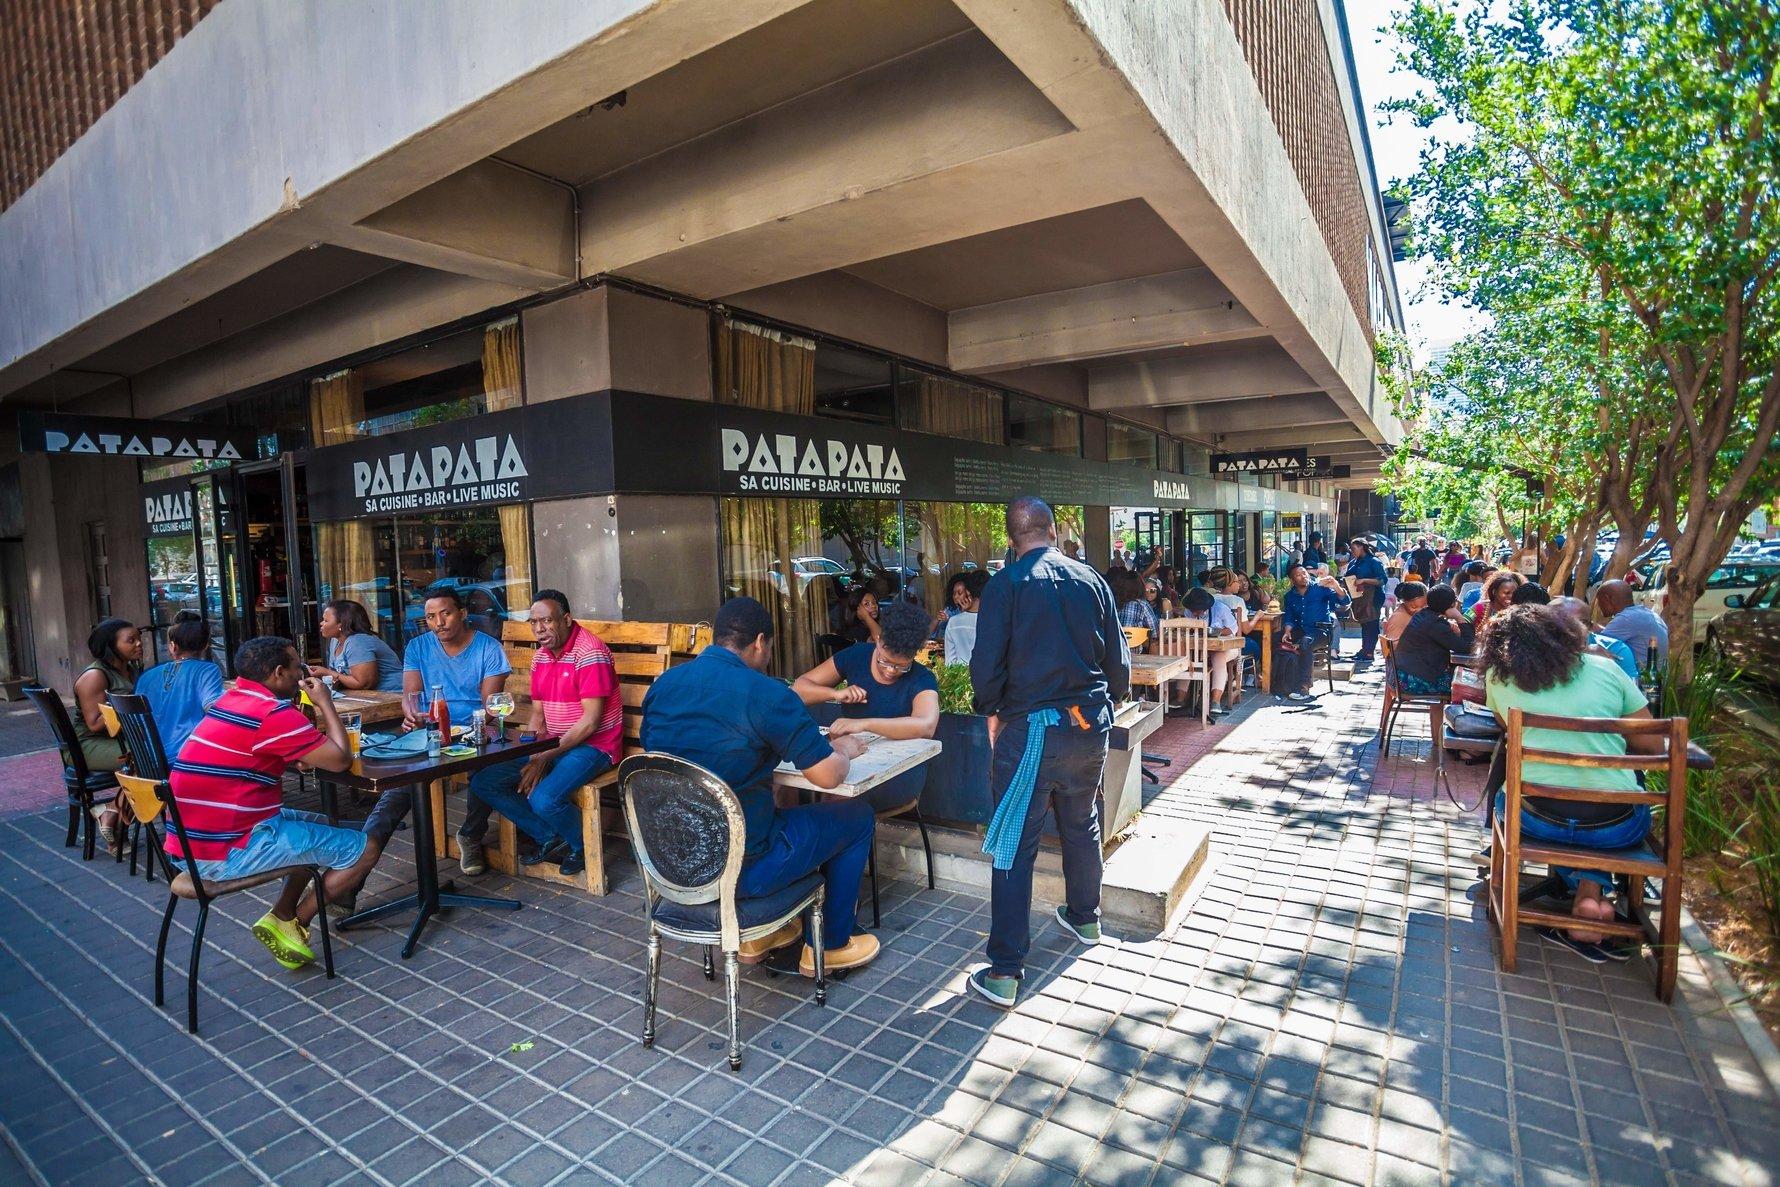 Maboneng's Pata Pata restaurant